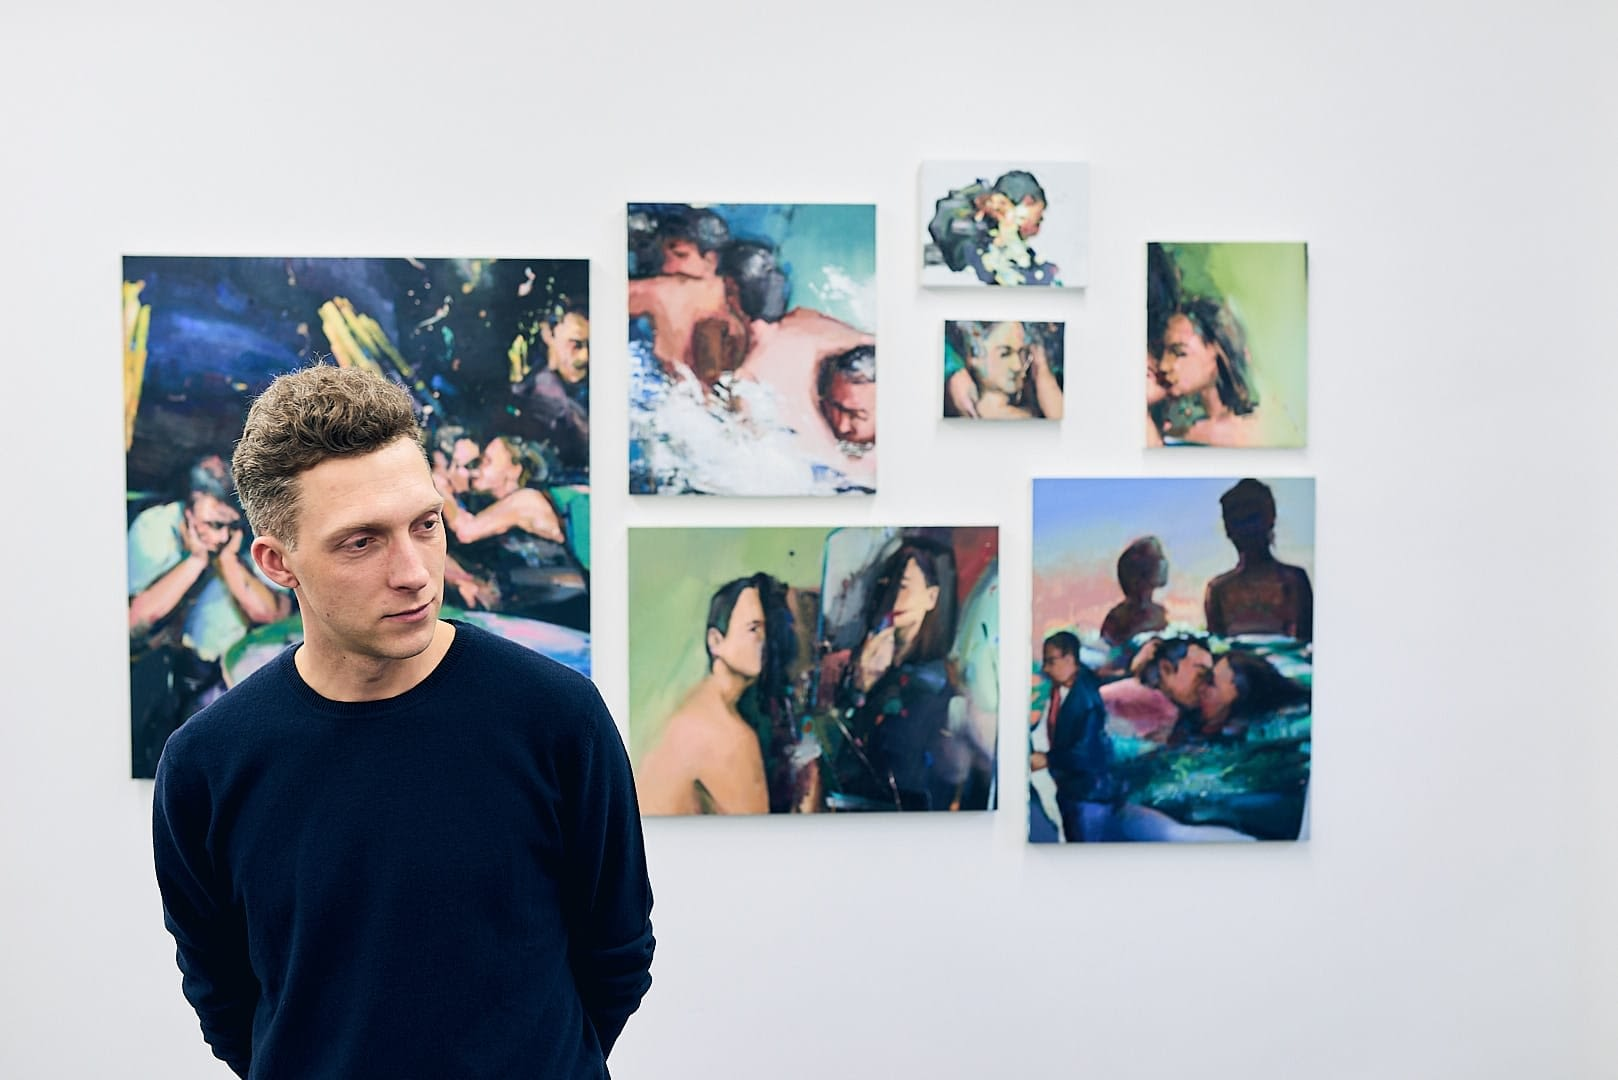 Maler Andrius Zakarauskas - Künstlerportrait 0859